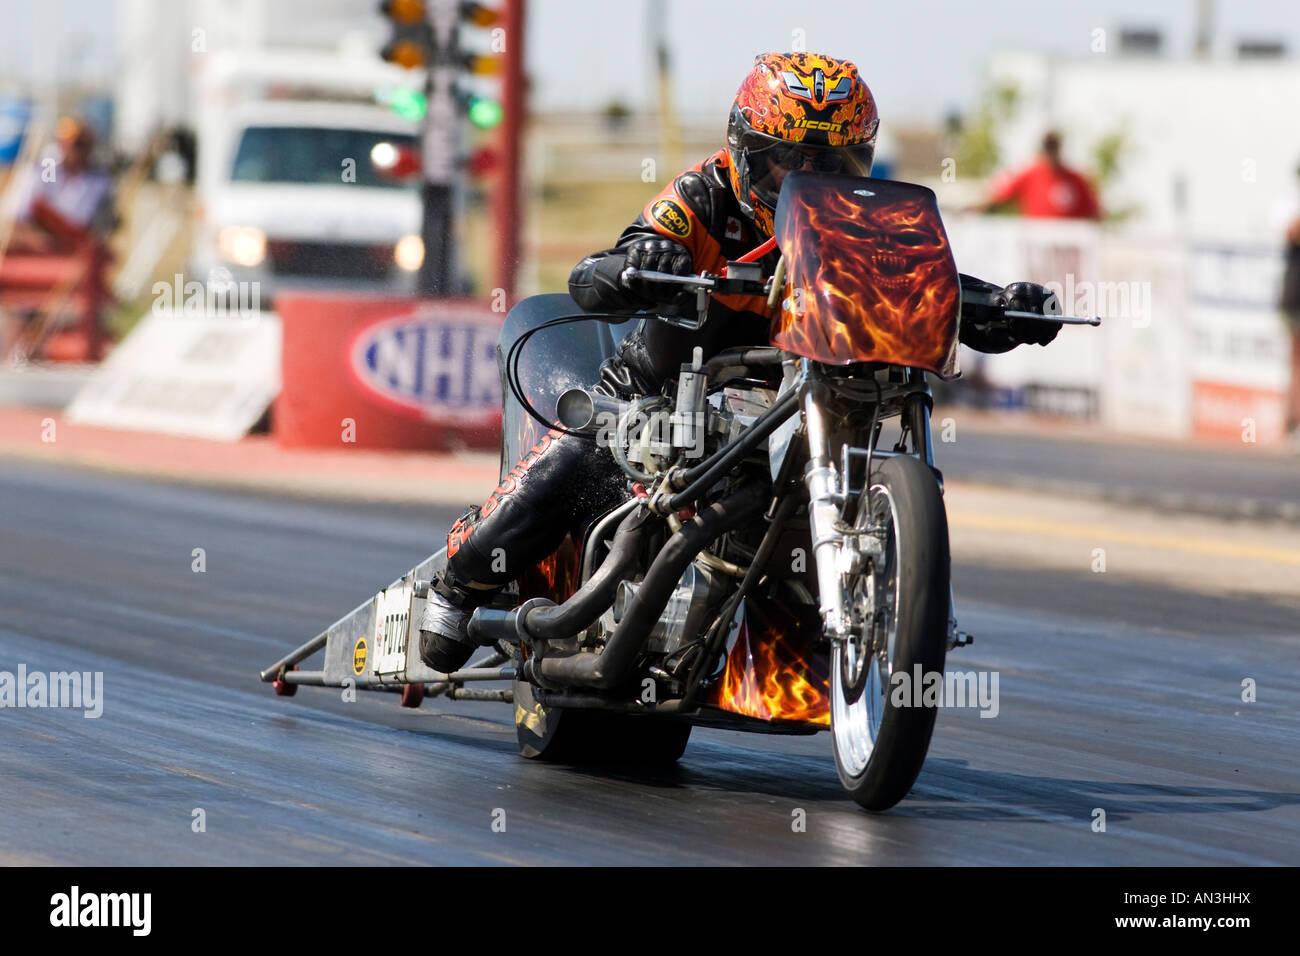 A Top Fuel Drag Bike Racing Stock Photo Royalty Free Image